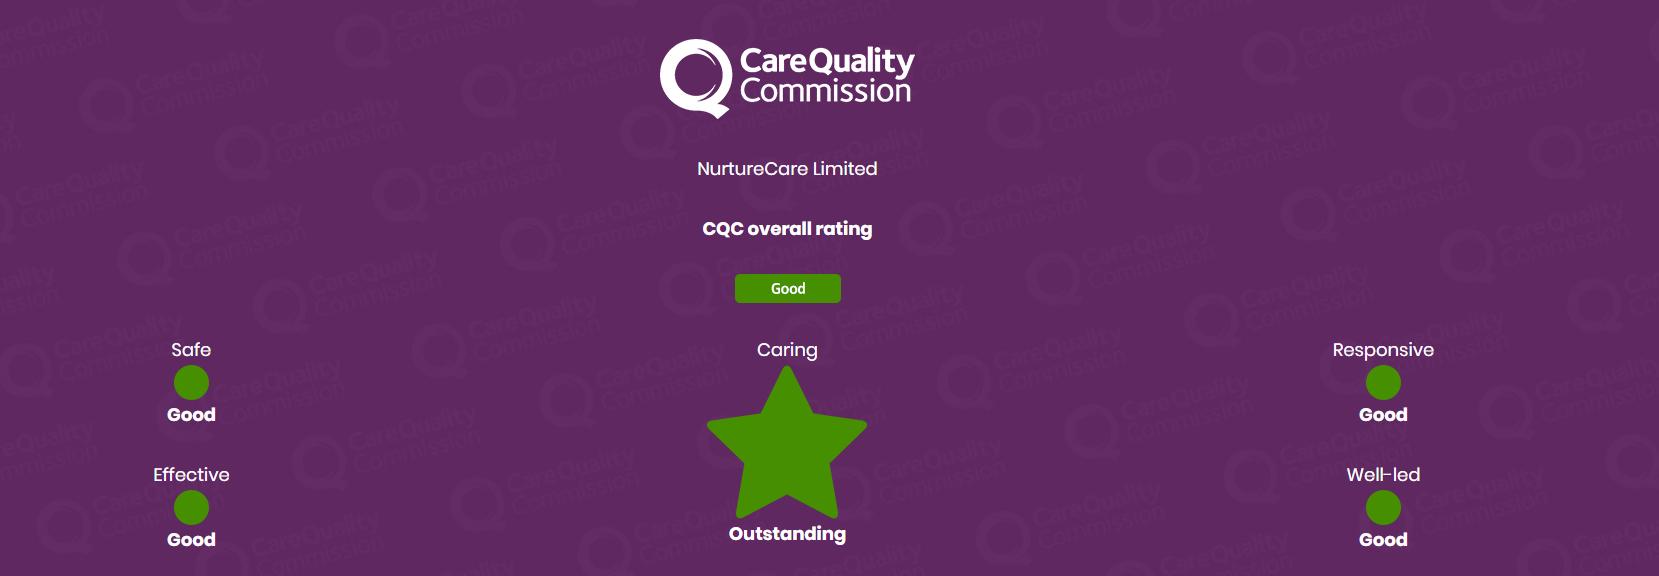 CQC Rating Full